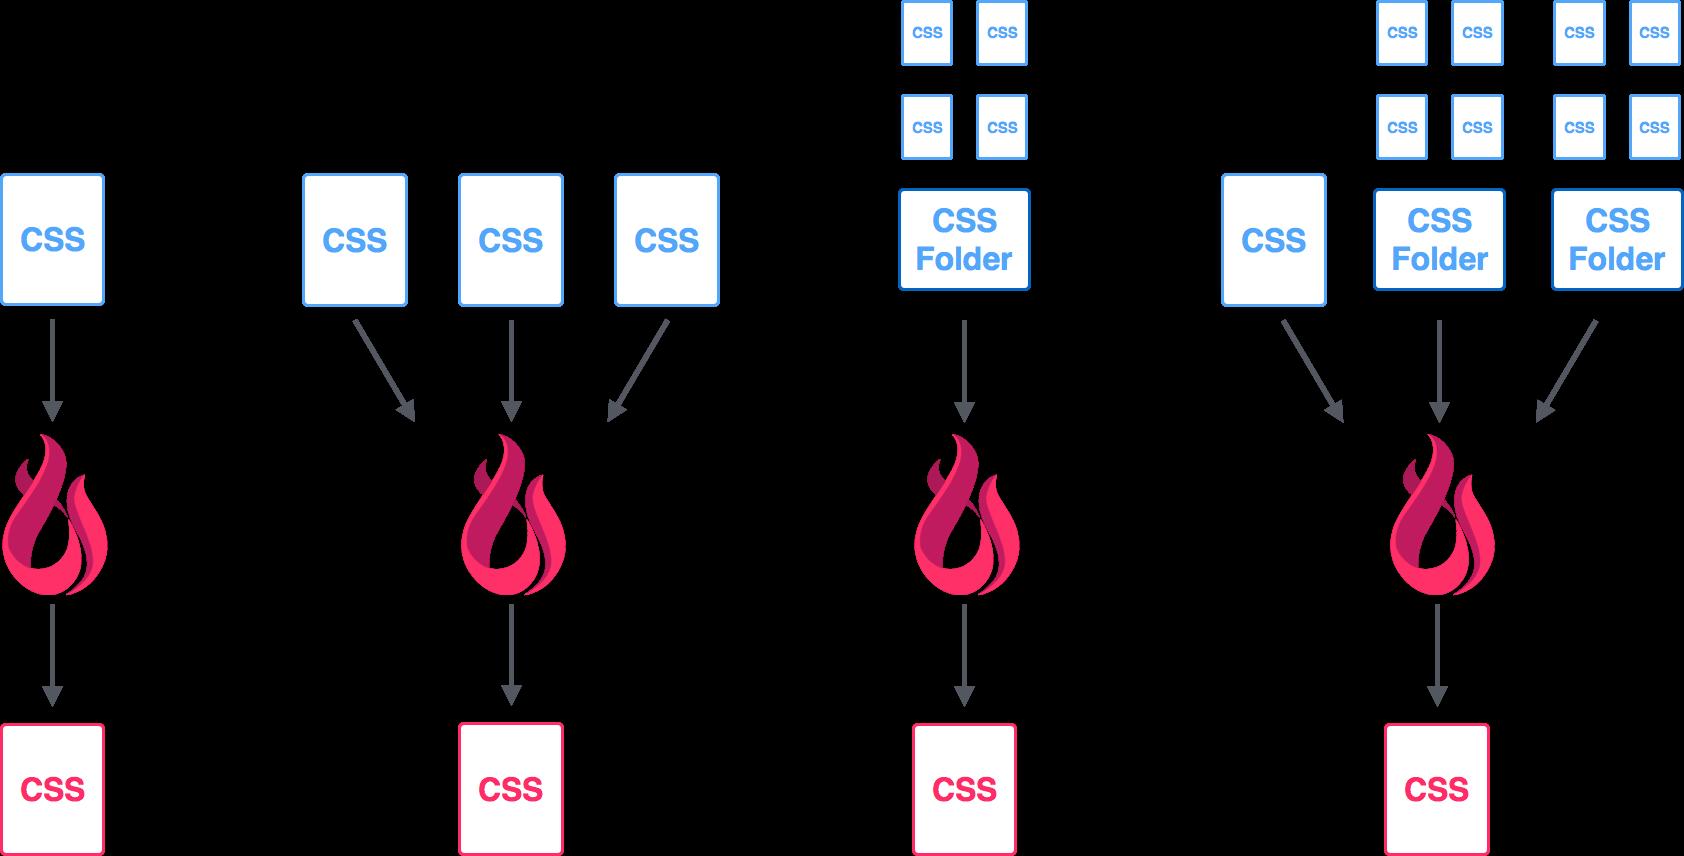 Purging CSS